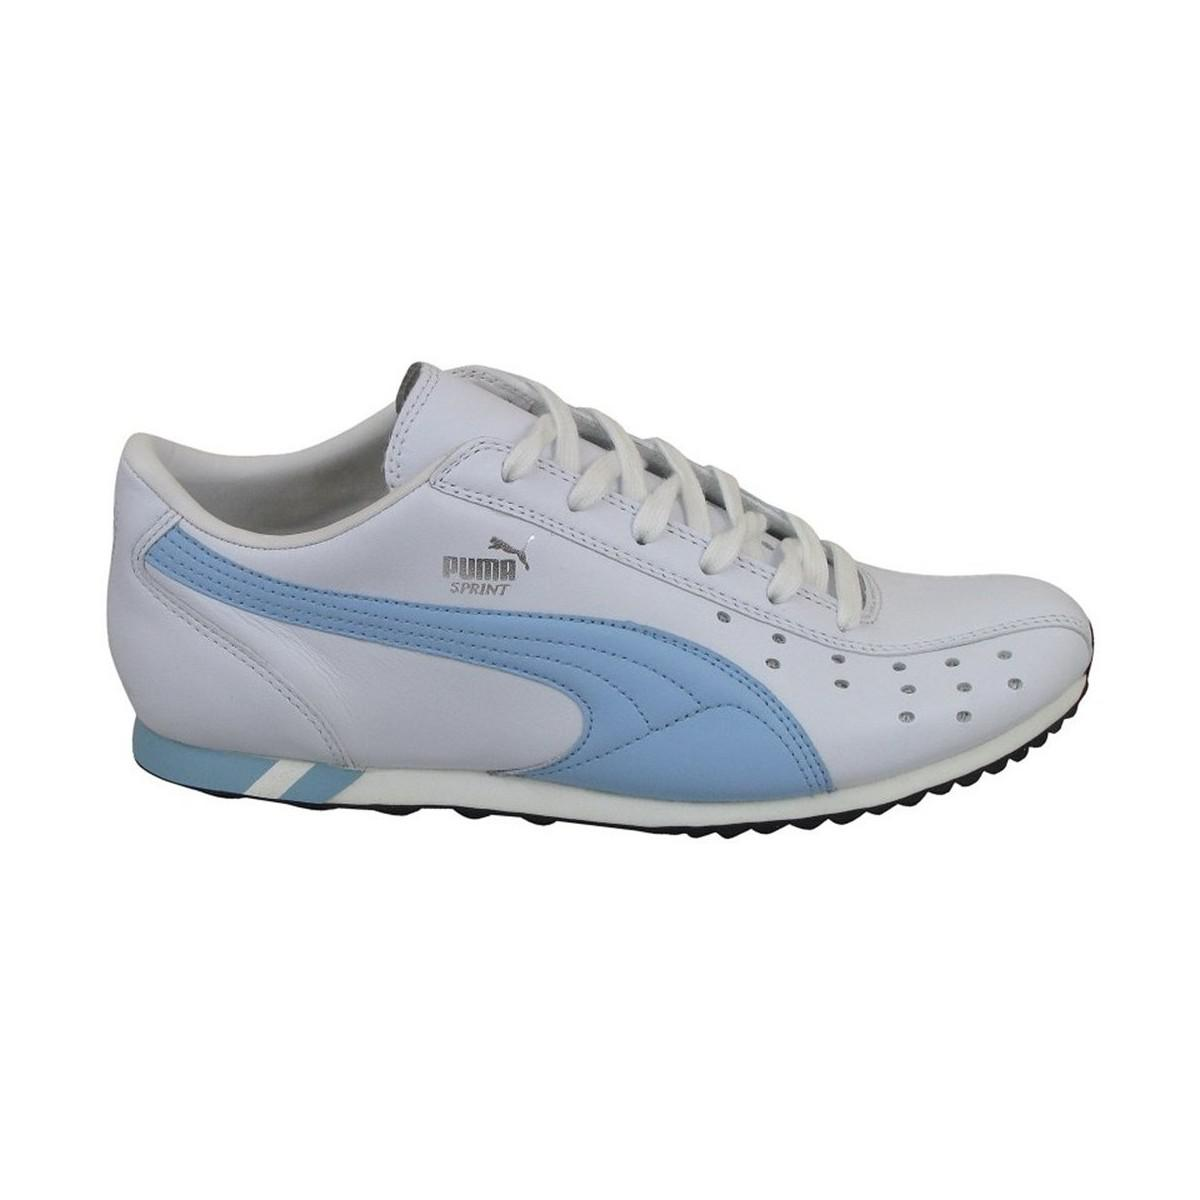 grand choix de 67f34 e4e27 PUMA Sprint Women039 Women's Shoes (trainers) In White - Lyst